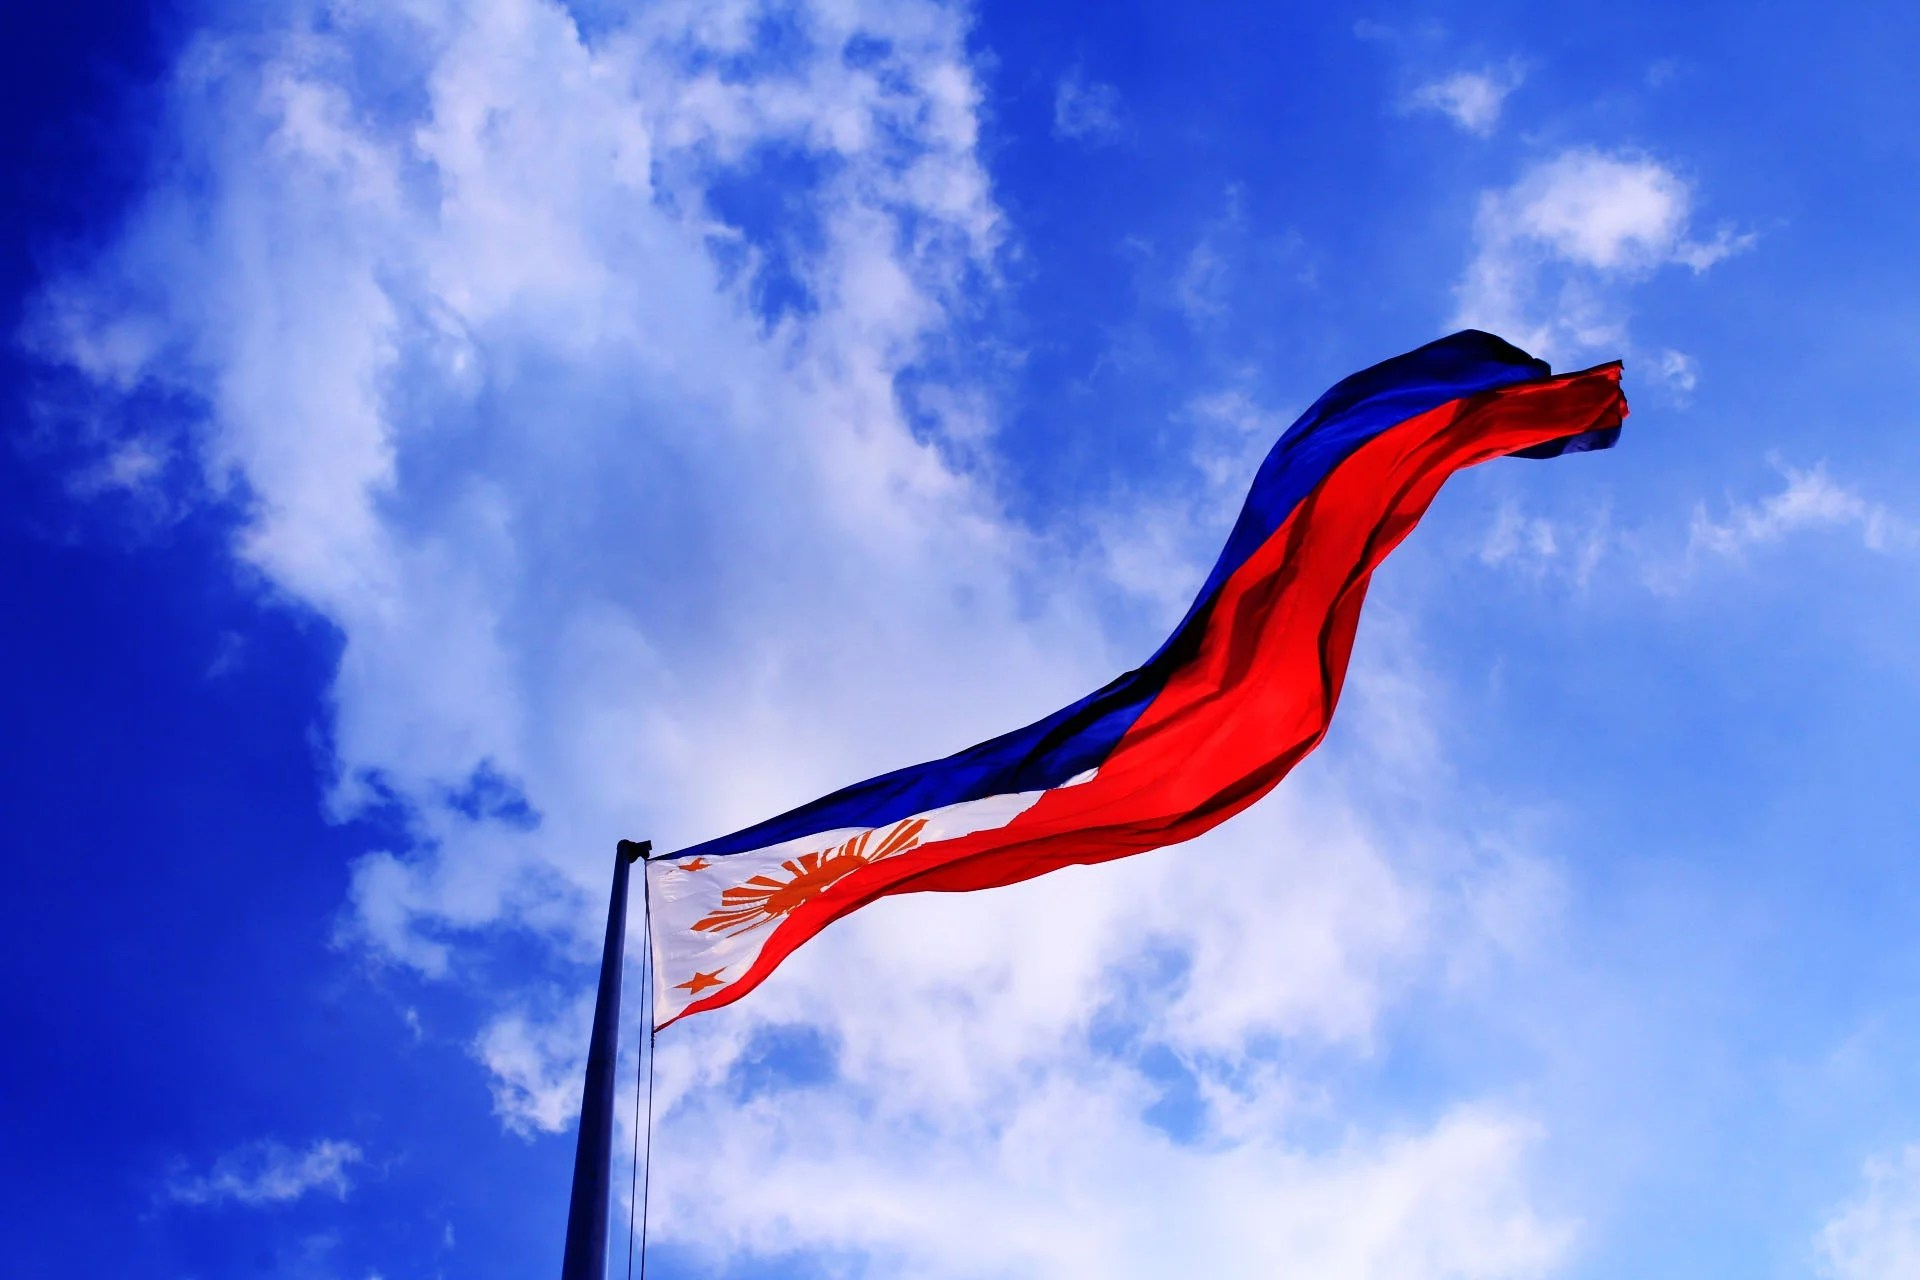 UnionBank de Filipinas emite su propia criptomoneda PHX